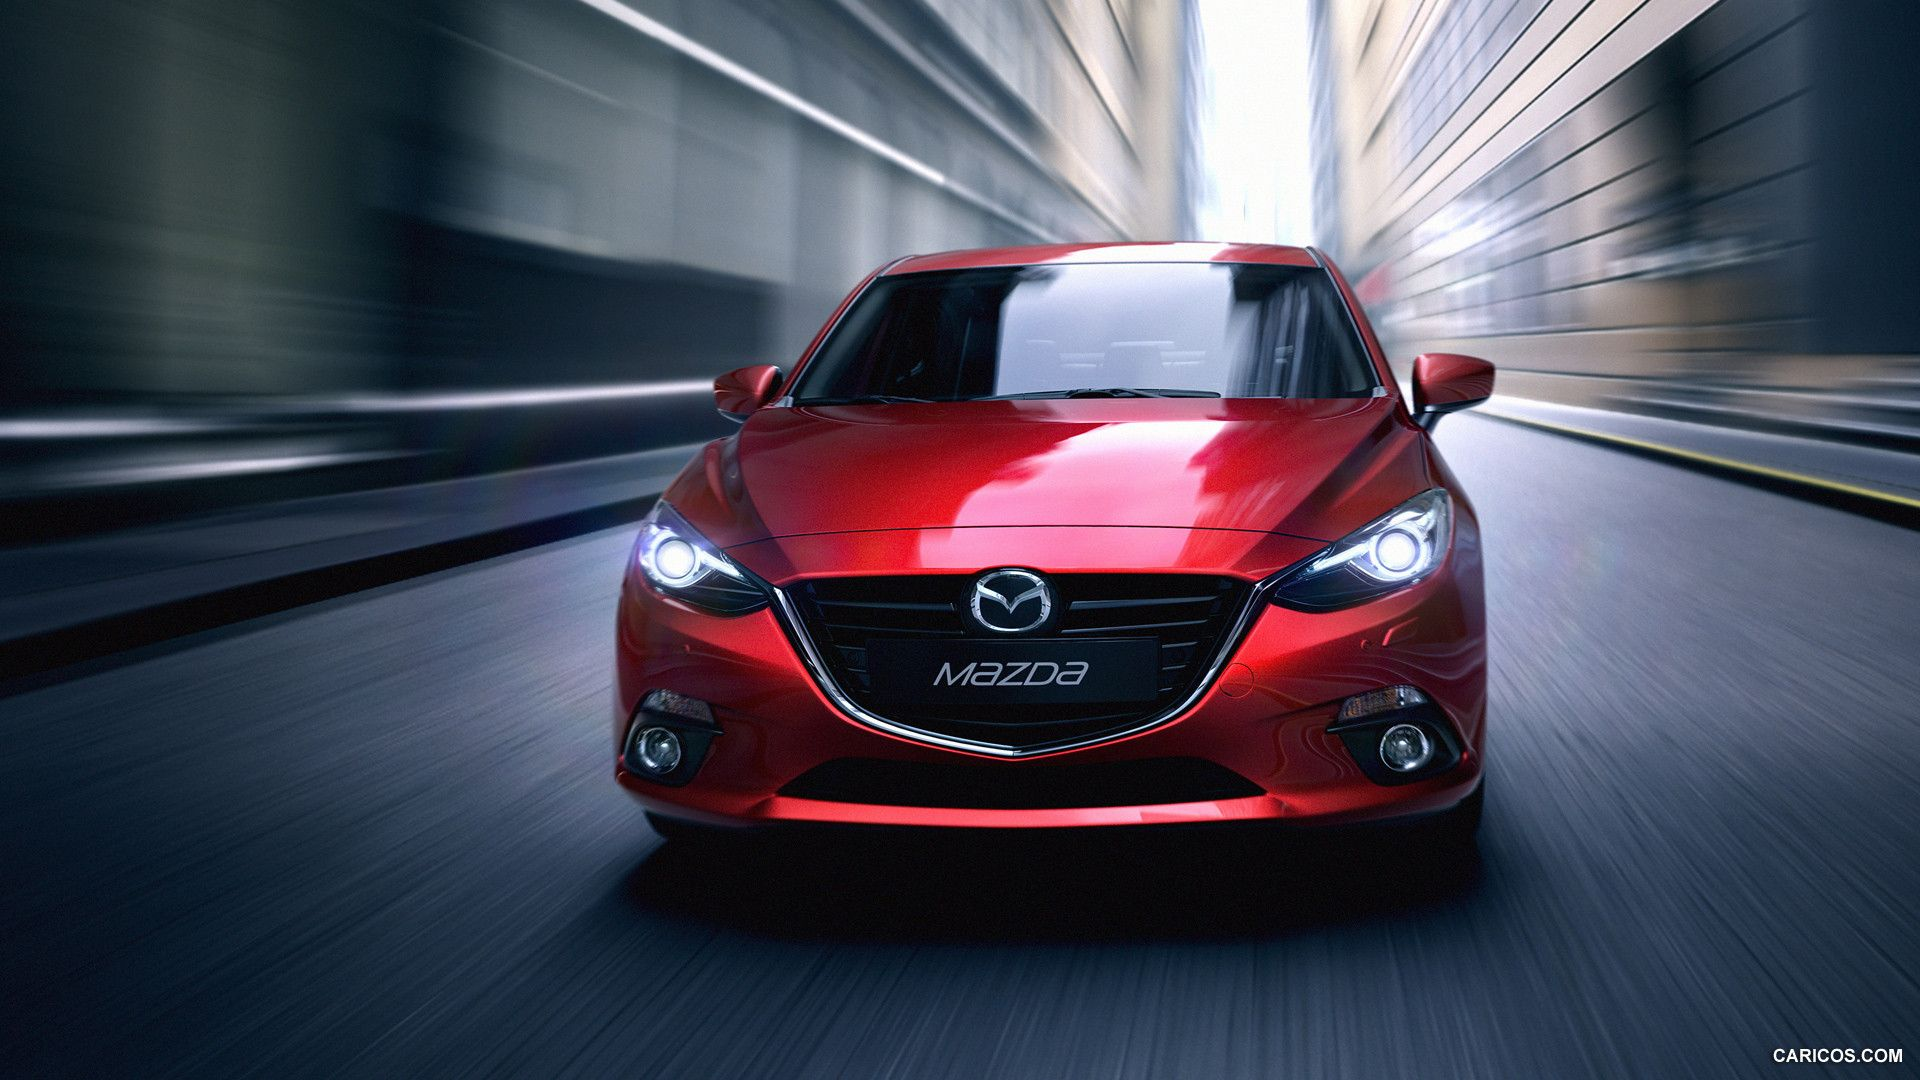 Mazda a wallpaper